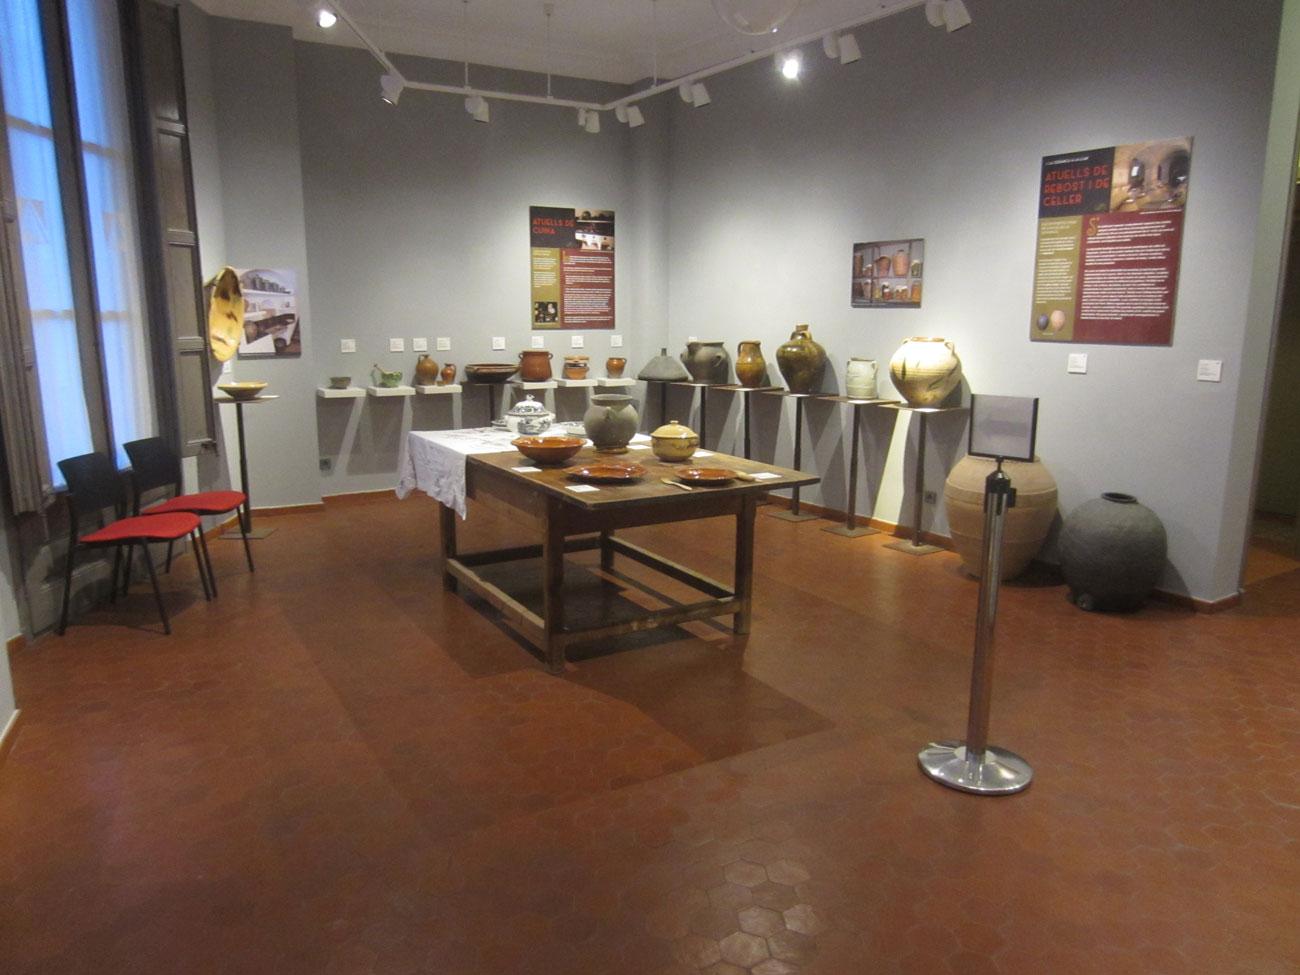 web-alfons-romero-casa-museu-cal-gerrer-fundacio-cabanas-78433